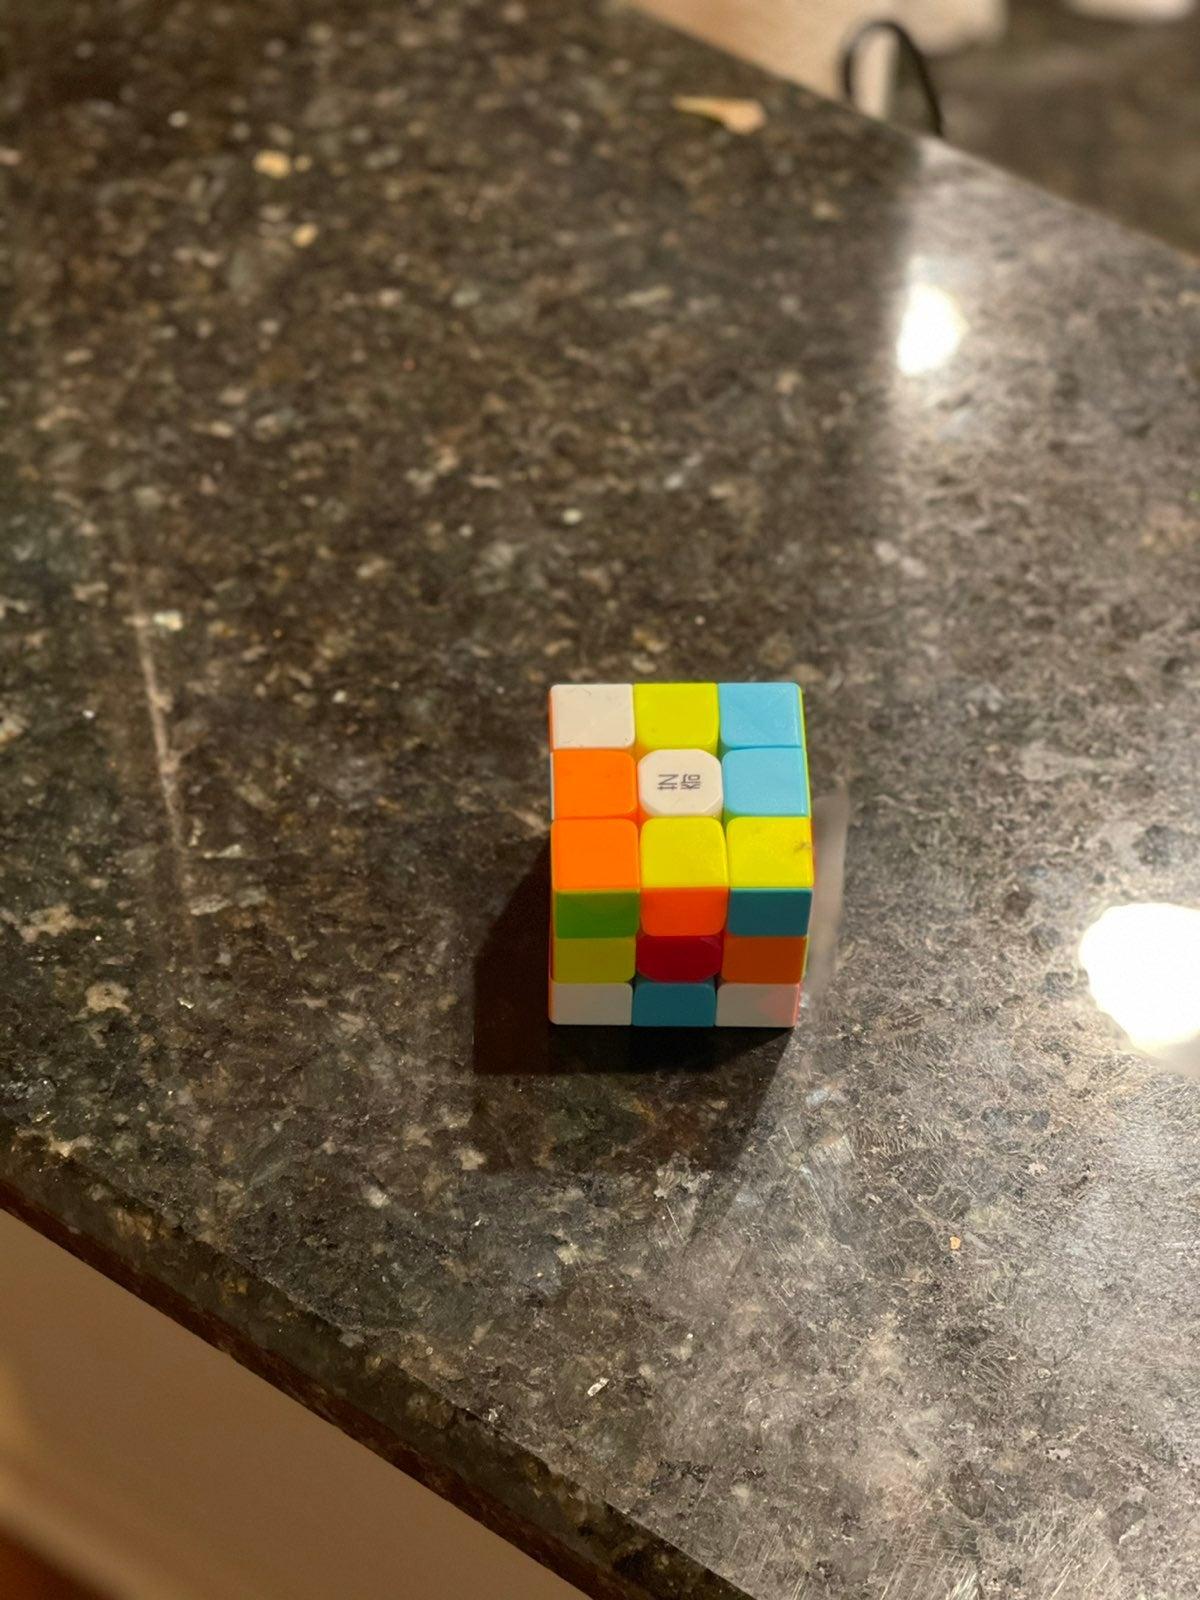 Speed rubiks cube